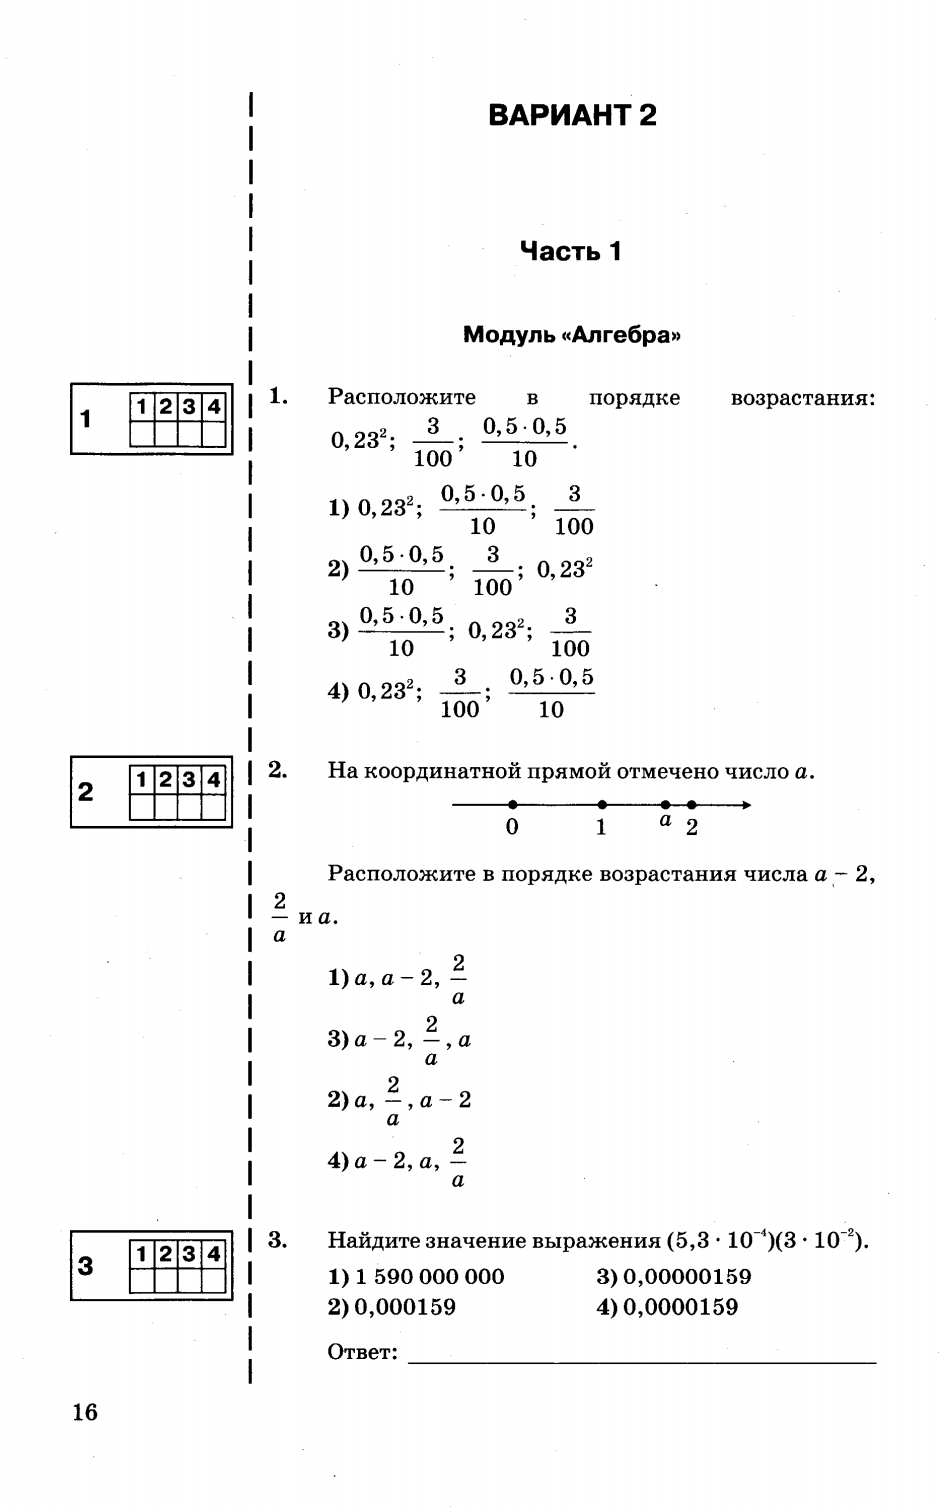 https://docs.google.com/viewer?pid=explorer&srcid=0Bw_f54pvrxEtbldKNGgyaFE3TDg&chrome=false&docid=e803bf4555b2fe7a8e01072ad16bc93b%7Cc9acad21277b9c8c76d1236b5bcea6e2&a=bi&pagenumber=17&w=939